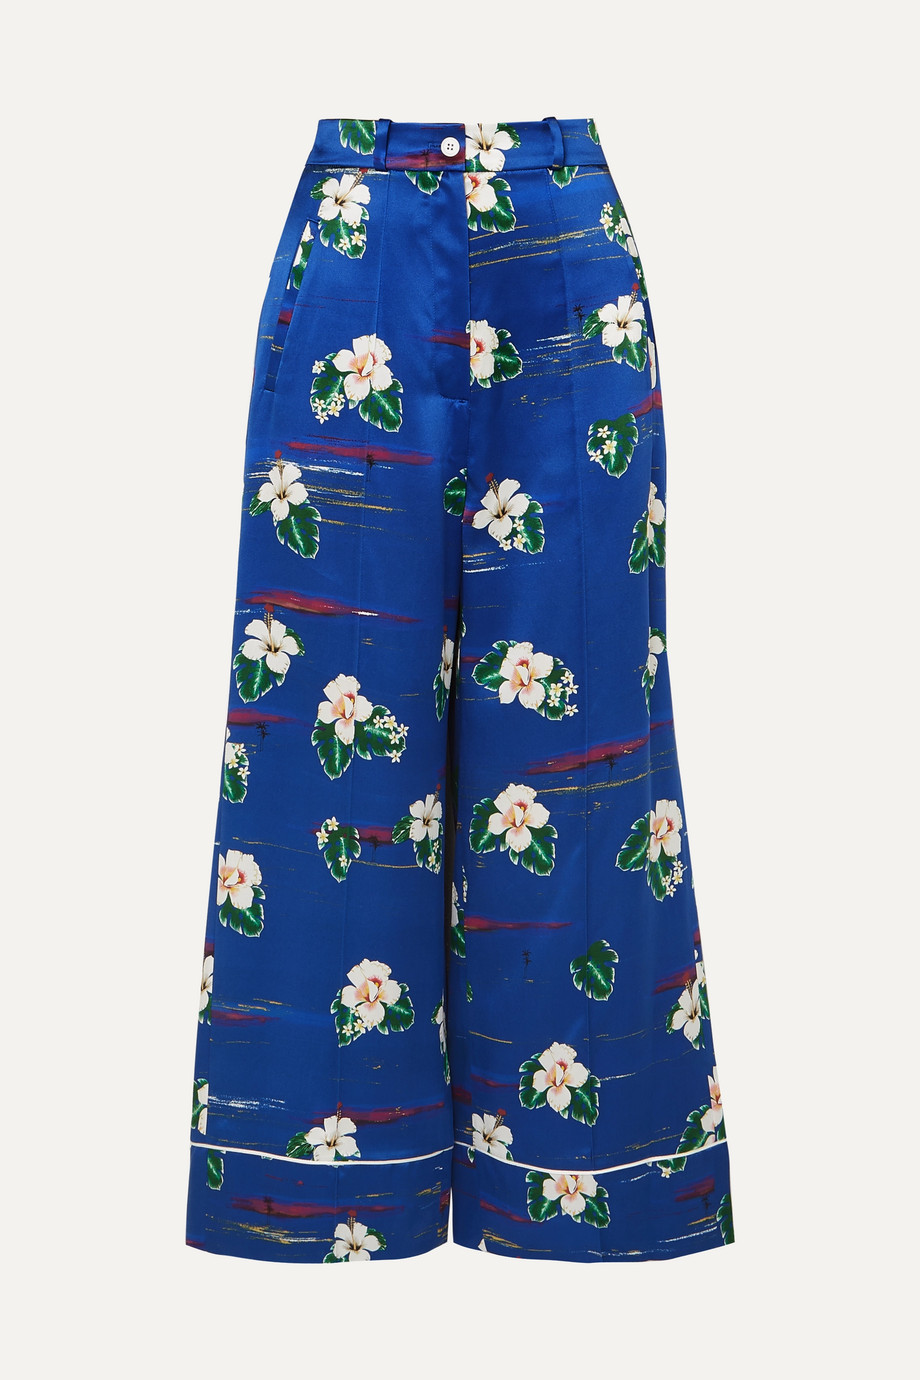 Racil Desert 花卉印花丝缎九分阔腿裤